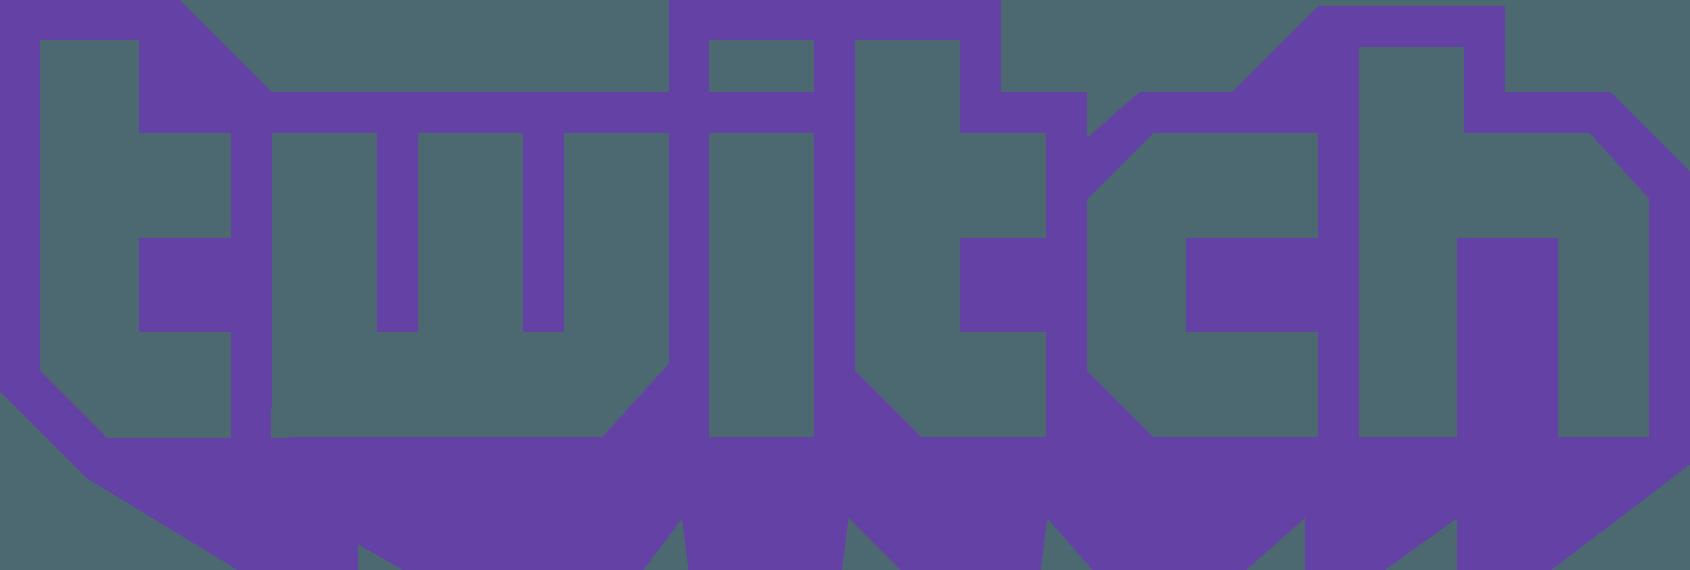 Twitch Logo [twitch.tv] png